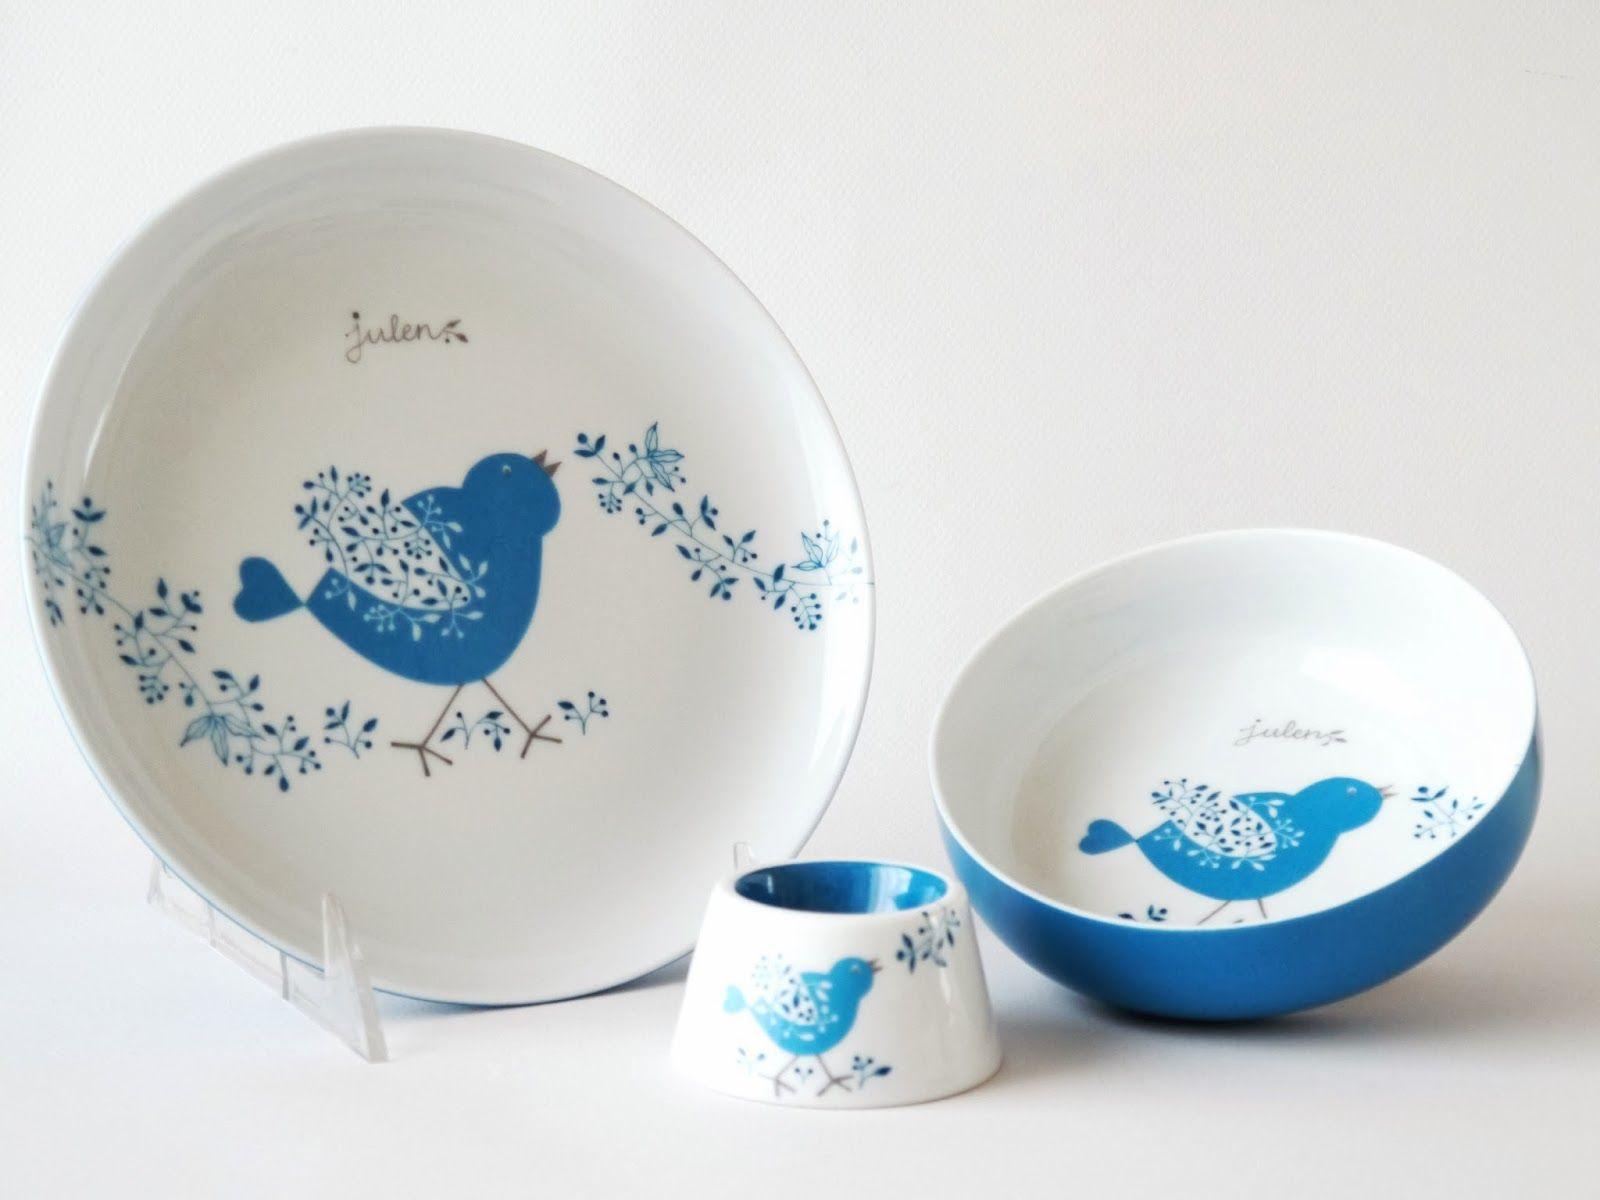 carolina leon firrell: vaisselle bébé personnalisée   anniversaire ...